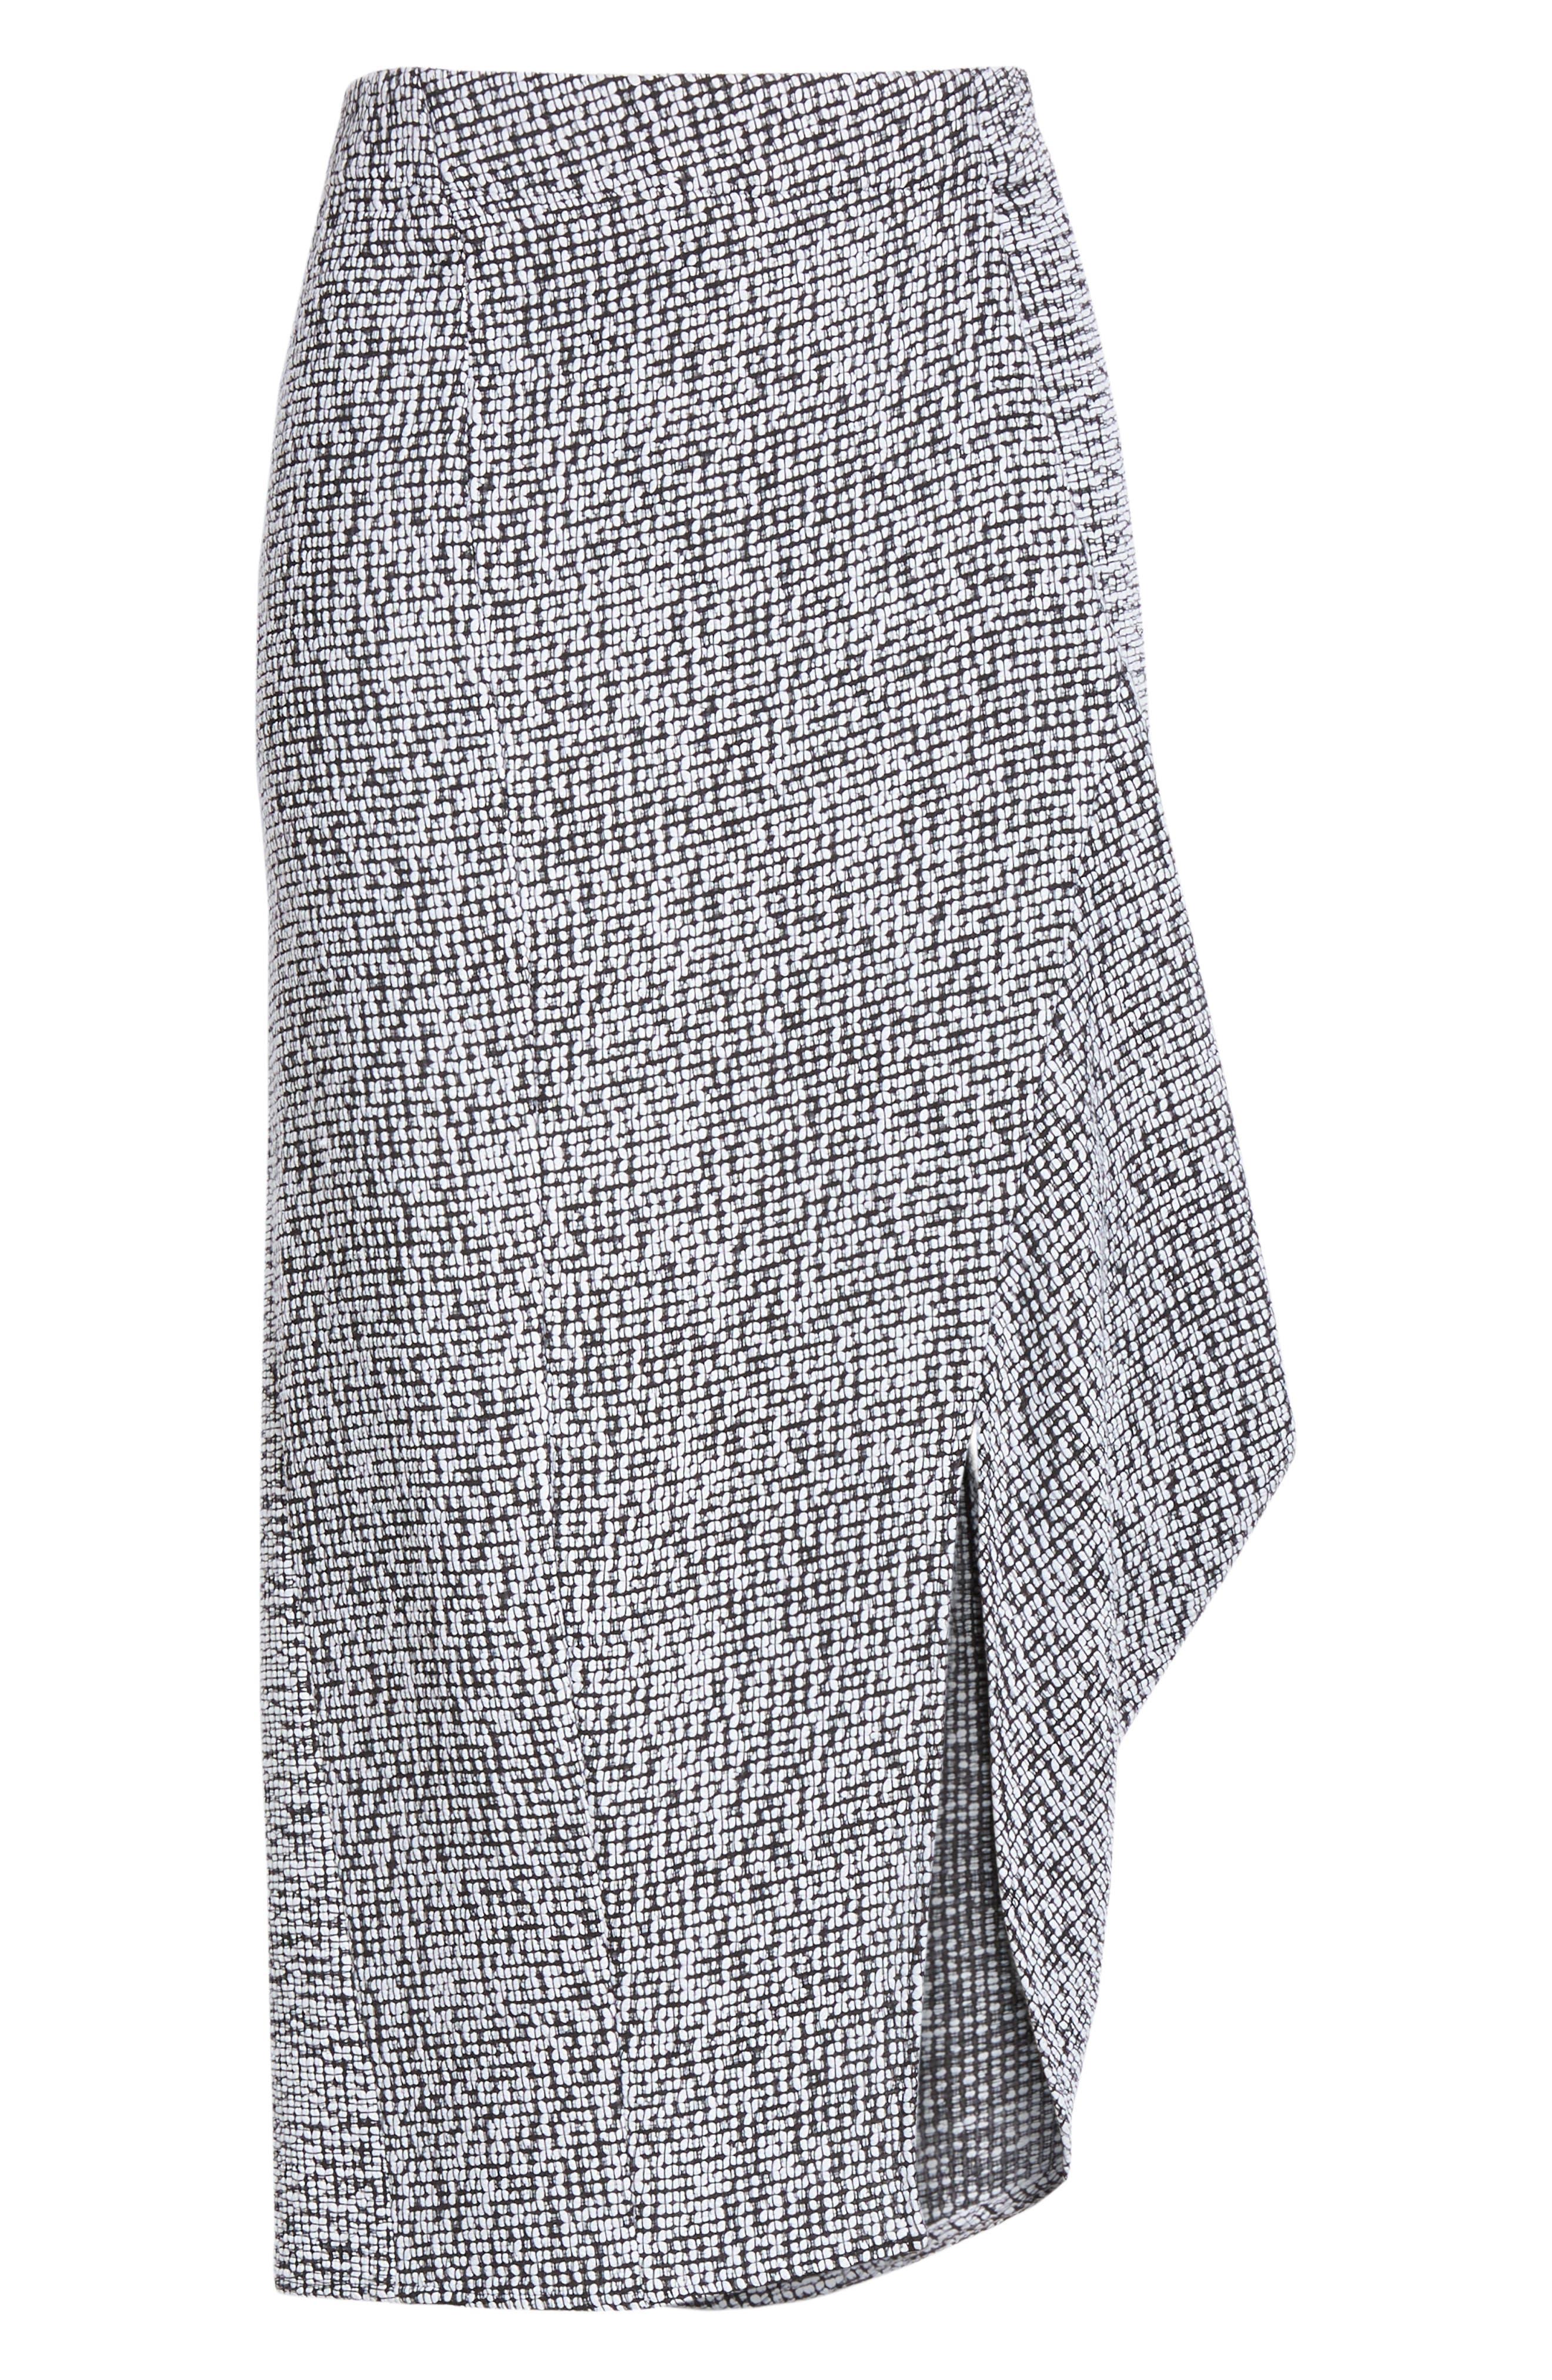 Mio Skirt,                             Alternate thumbnail 6, color,                             WHITE/ BLACK